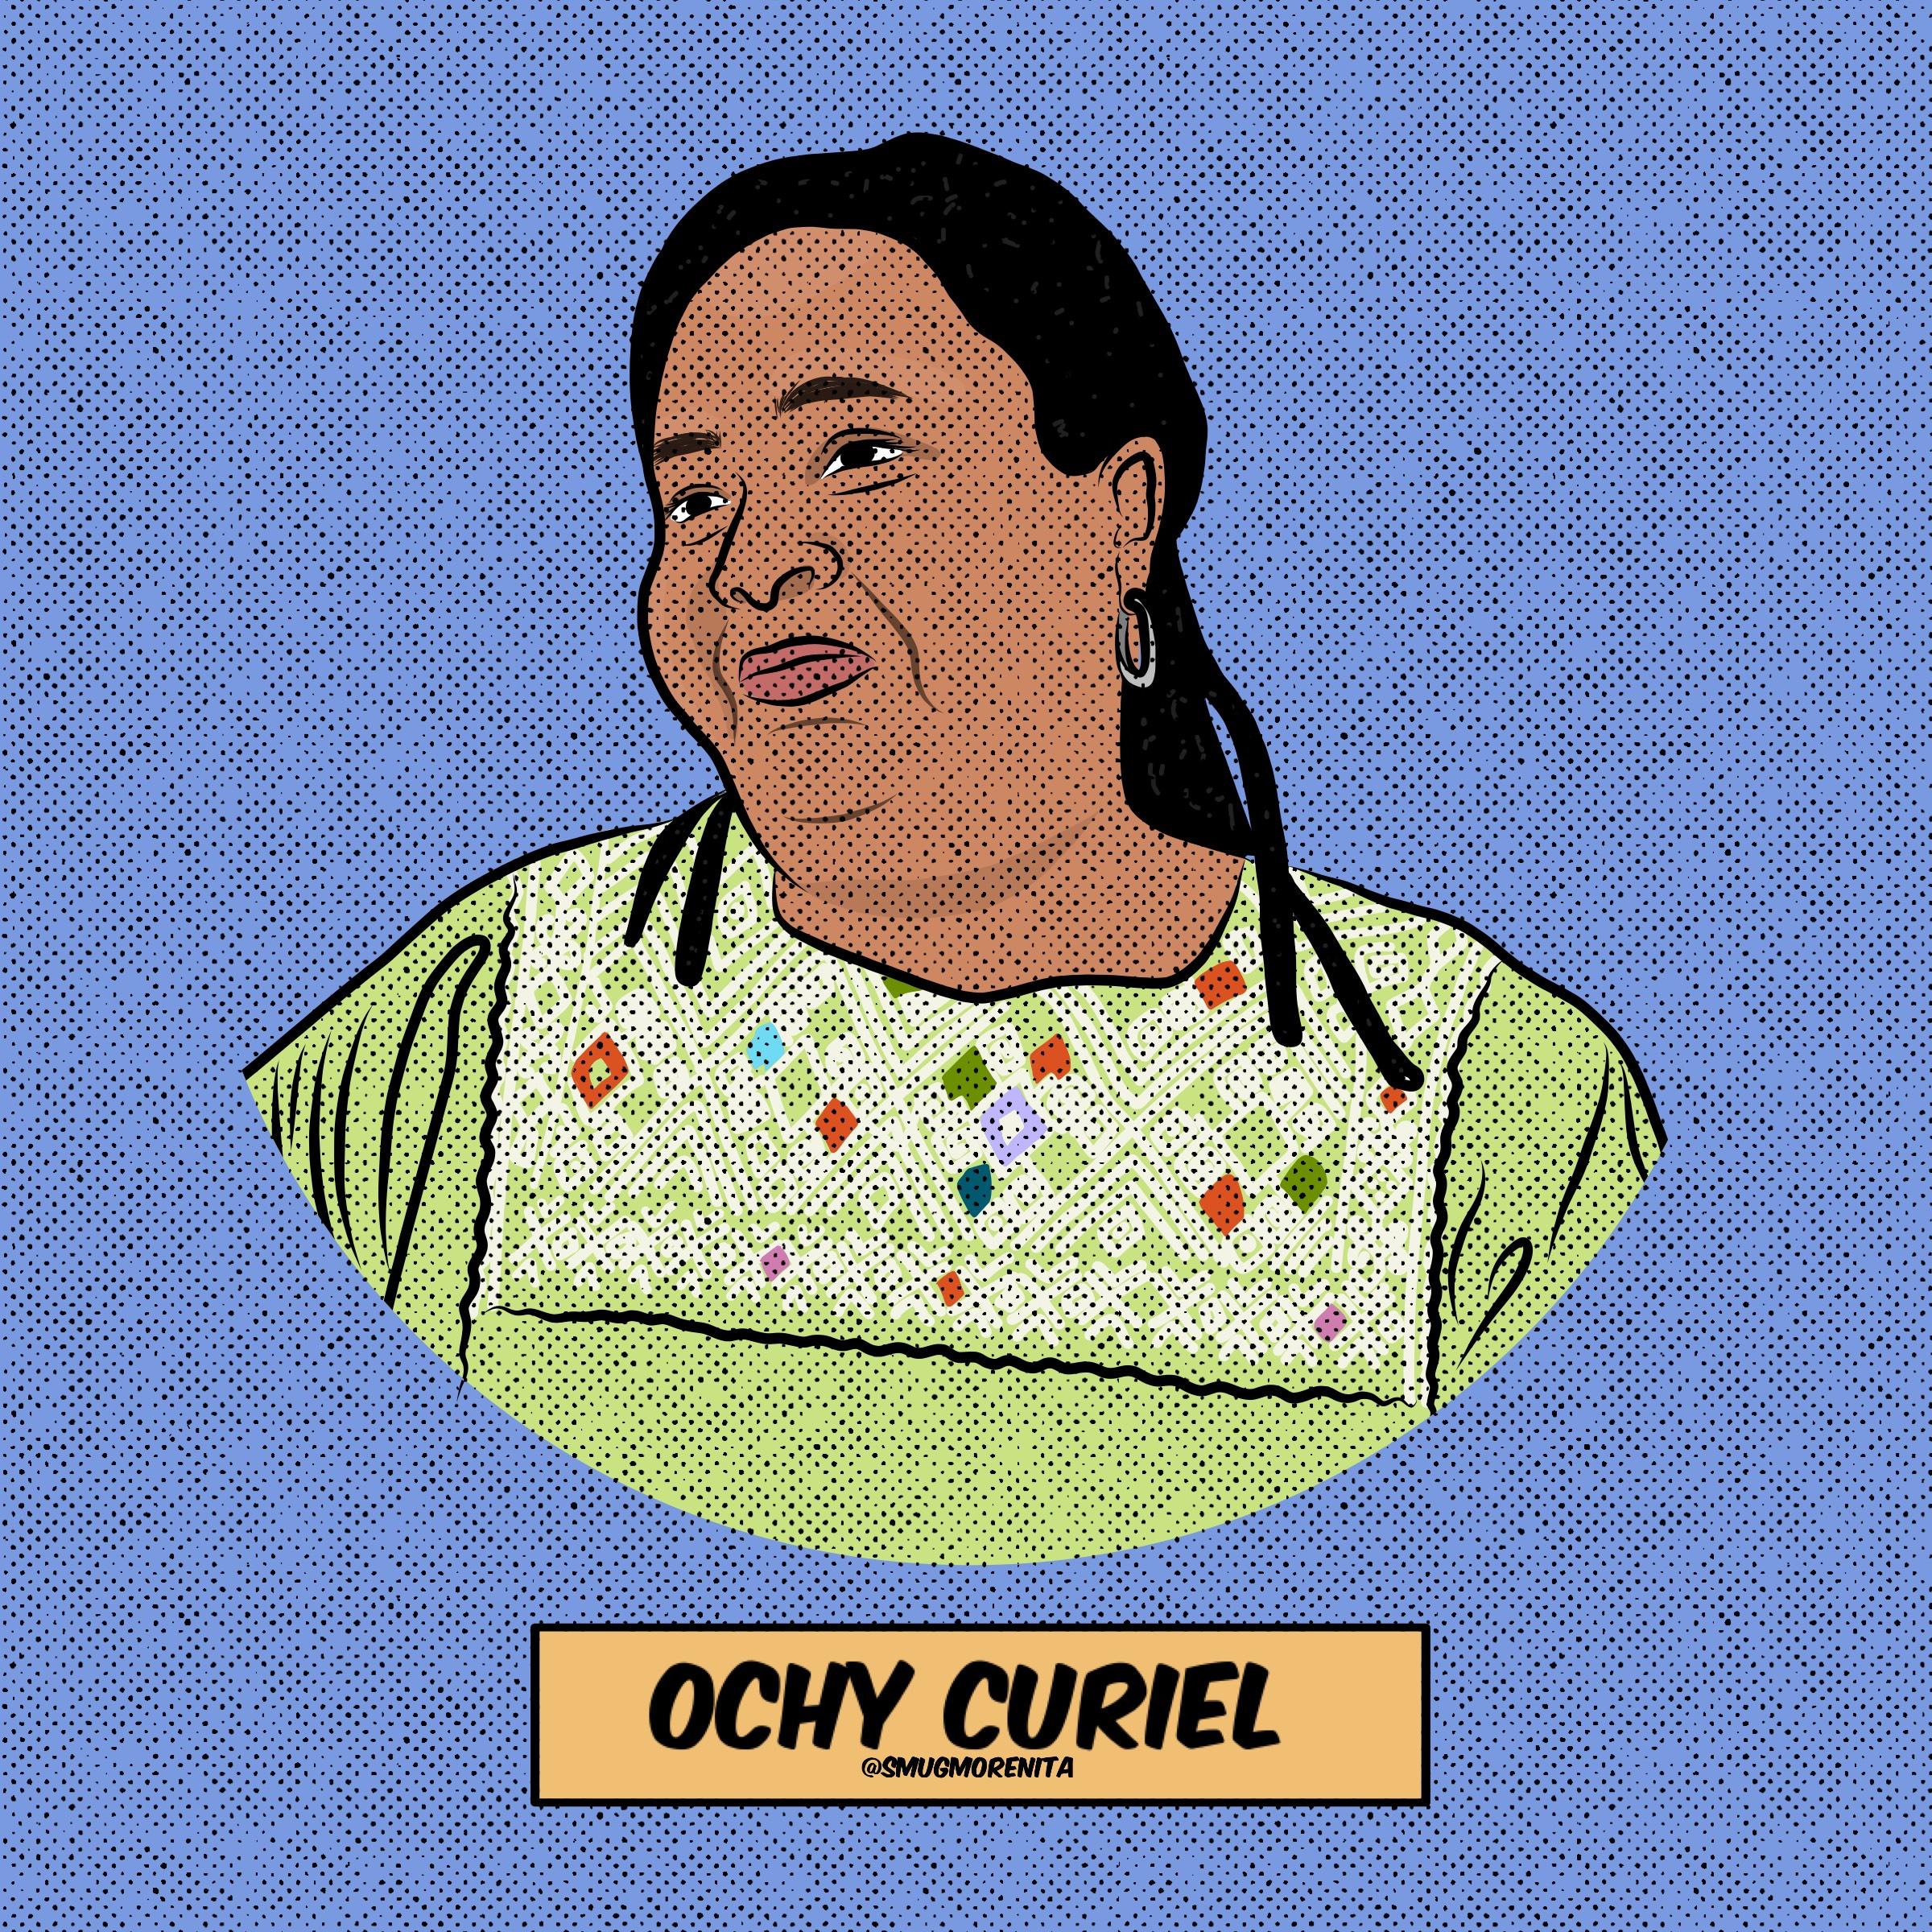 Ochy Curiel - Web Image .jpg